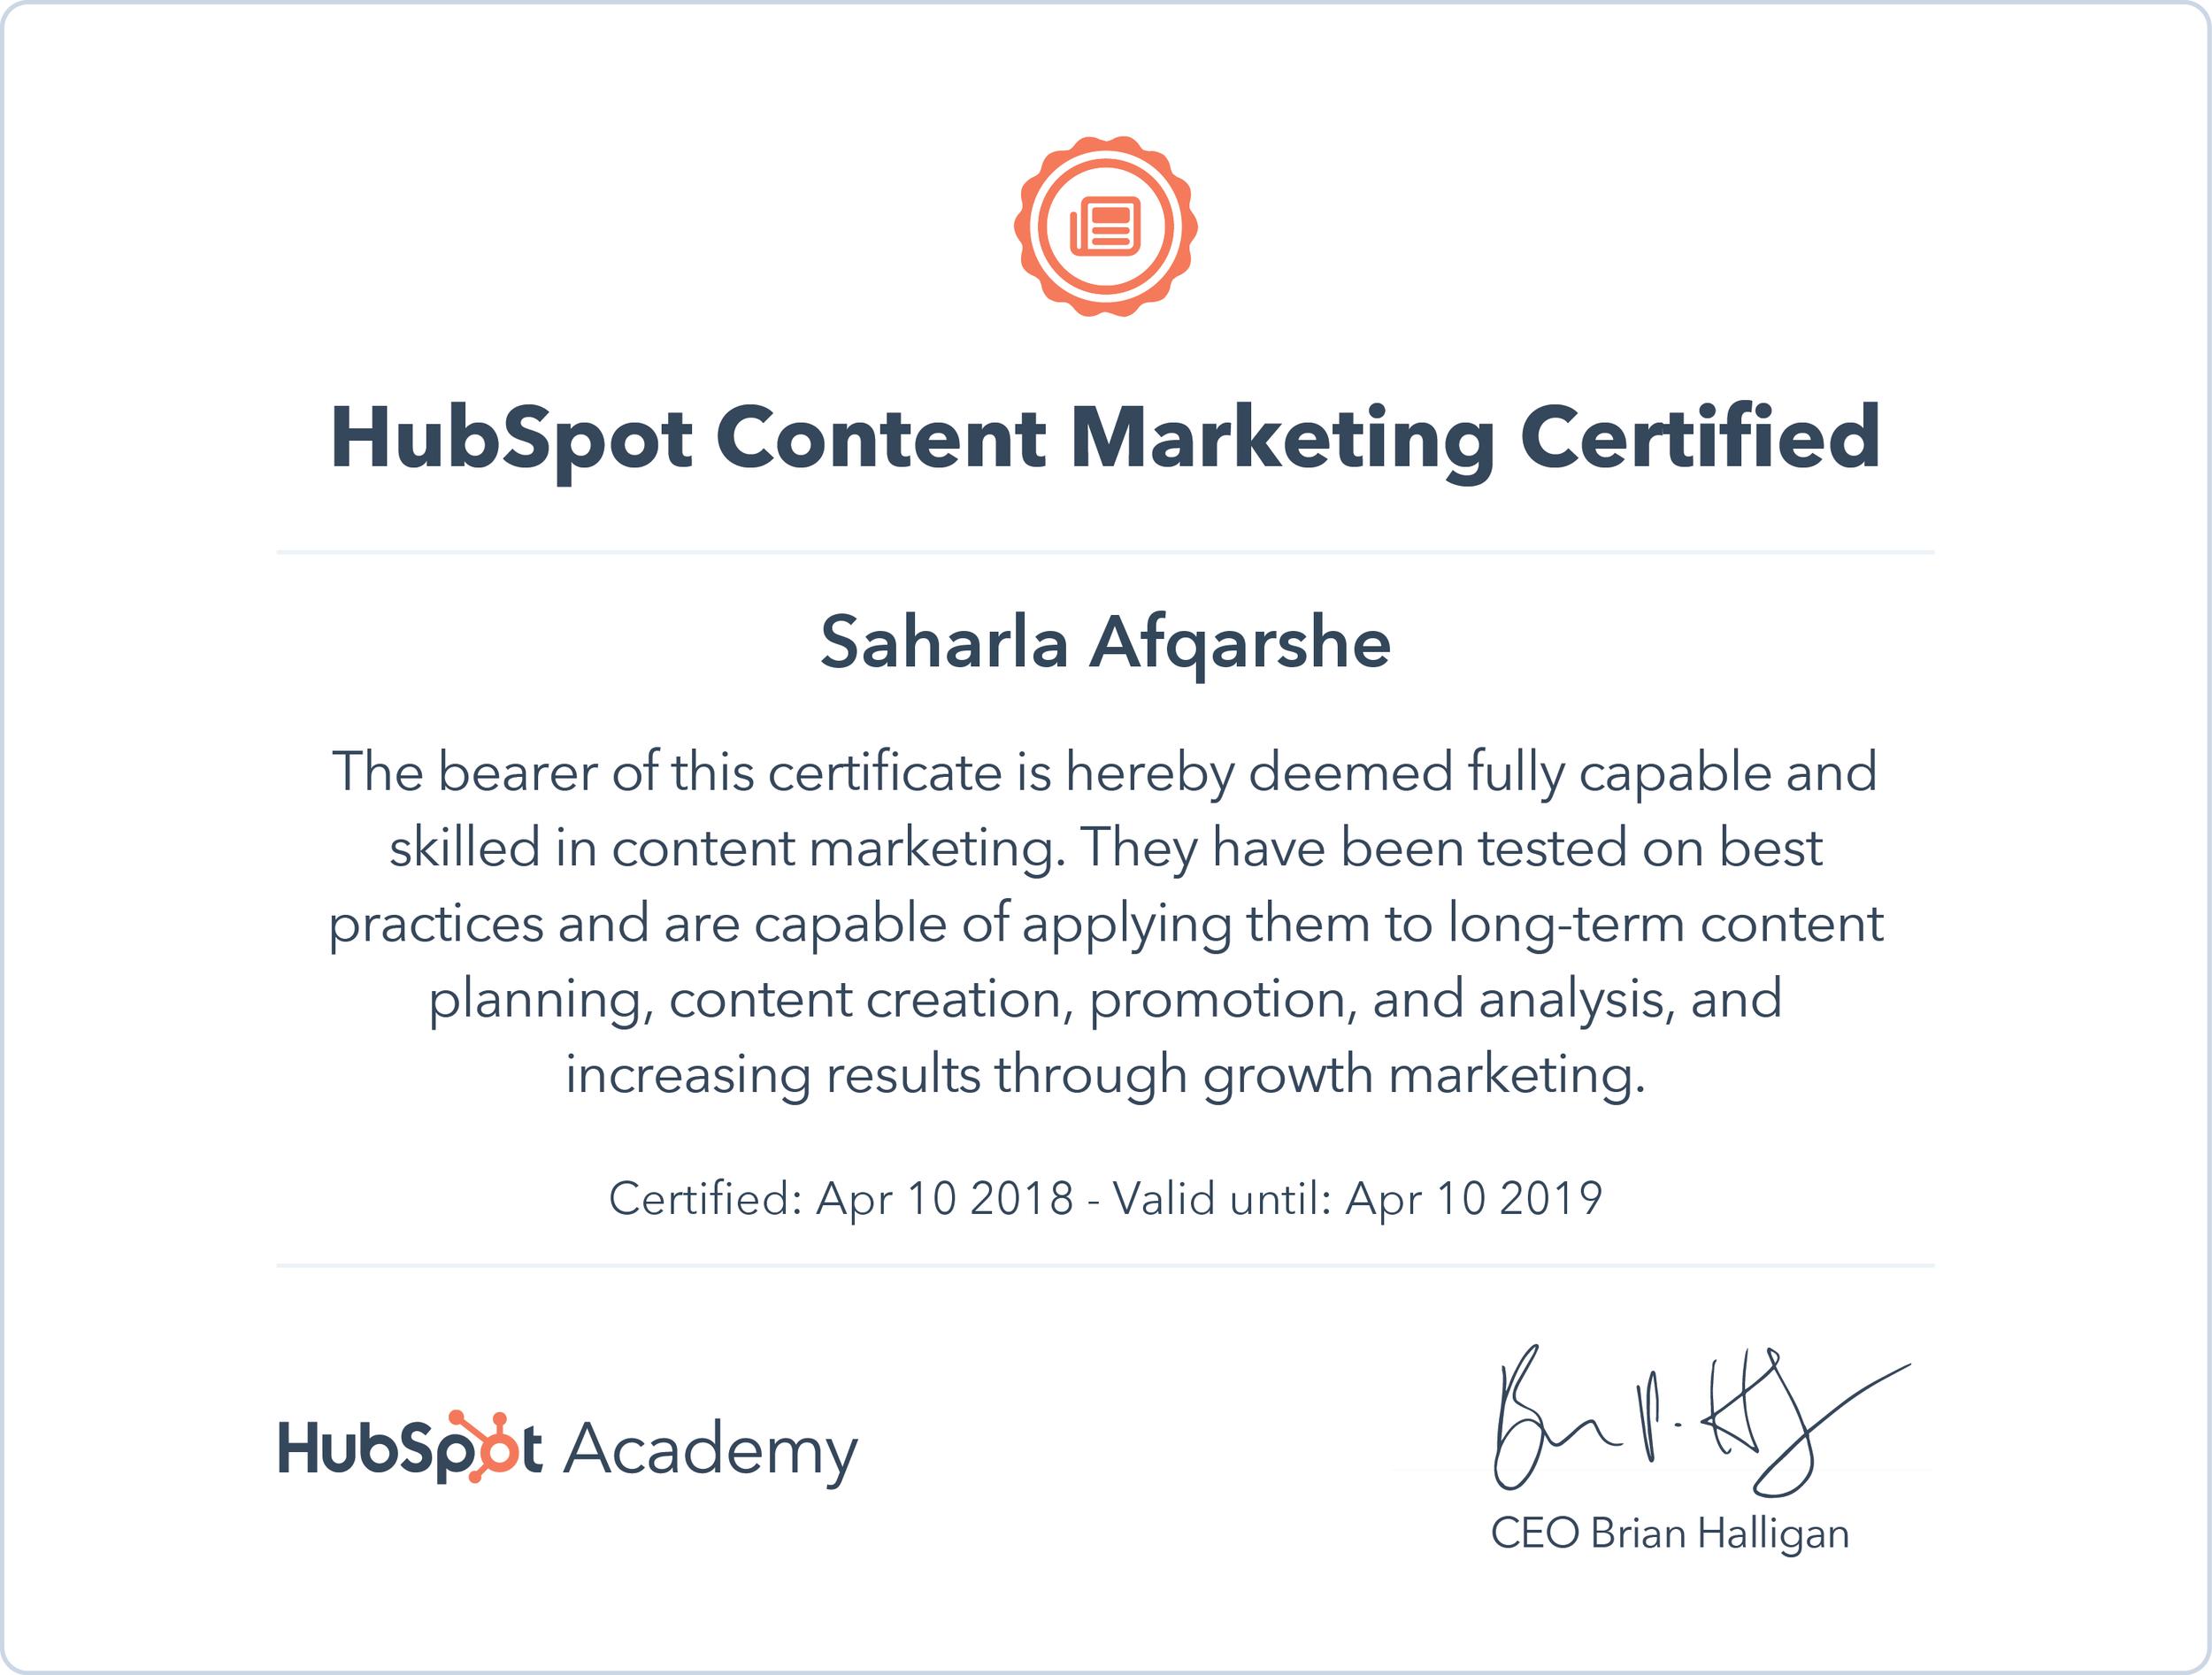 Content Marketing Certificate Saharla Afqarshe.png